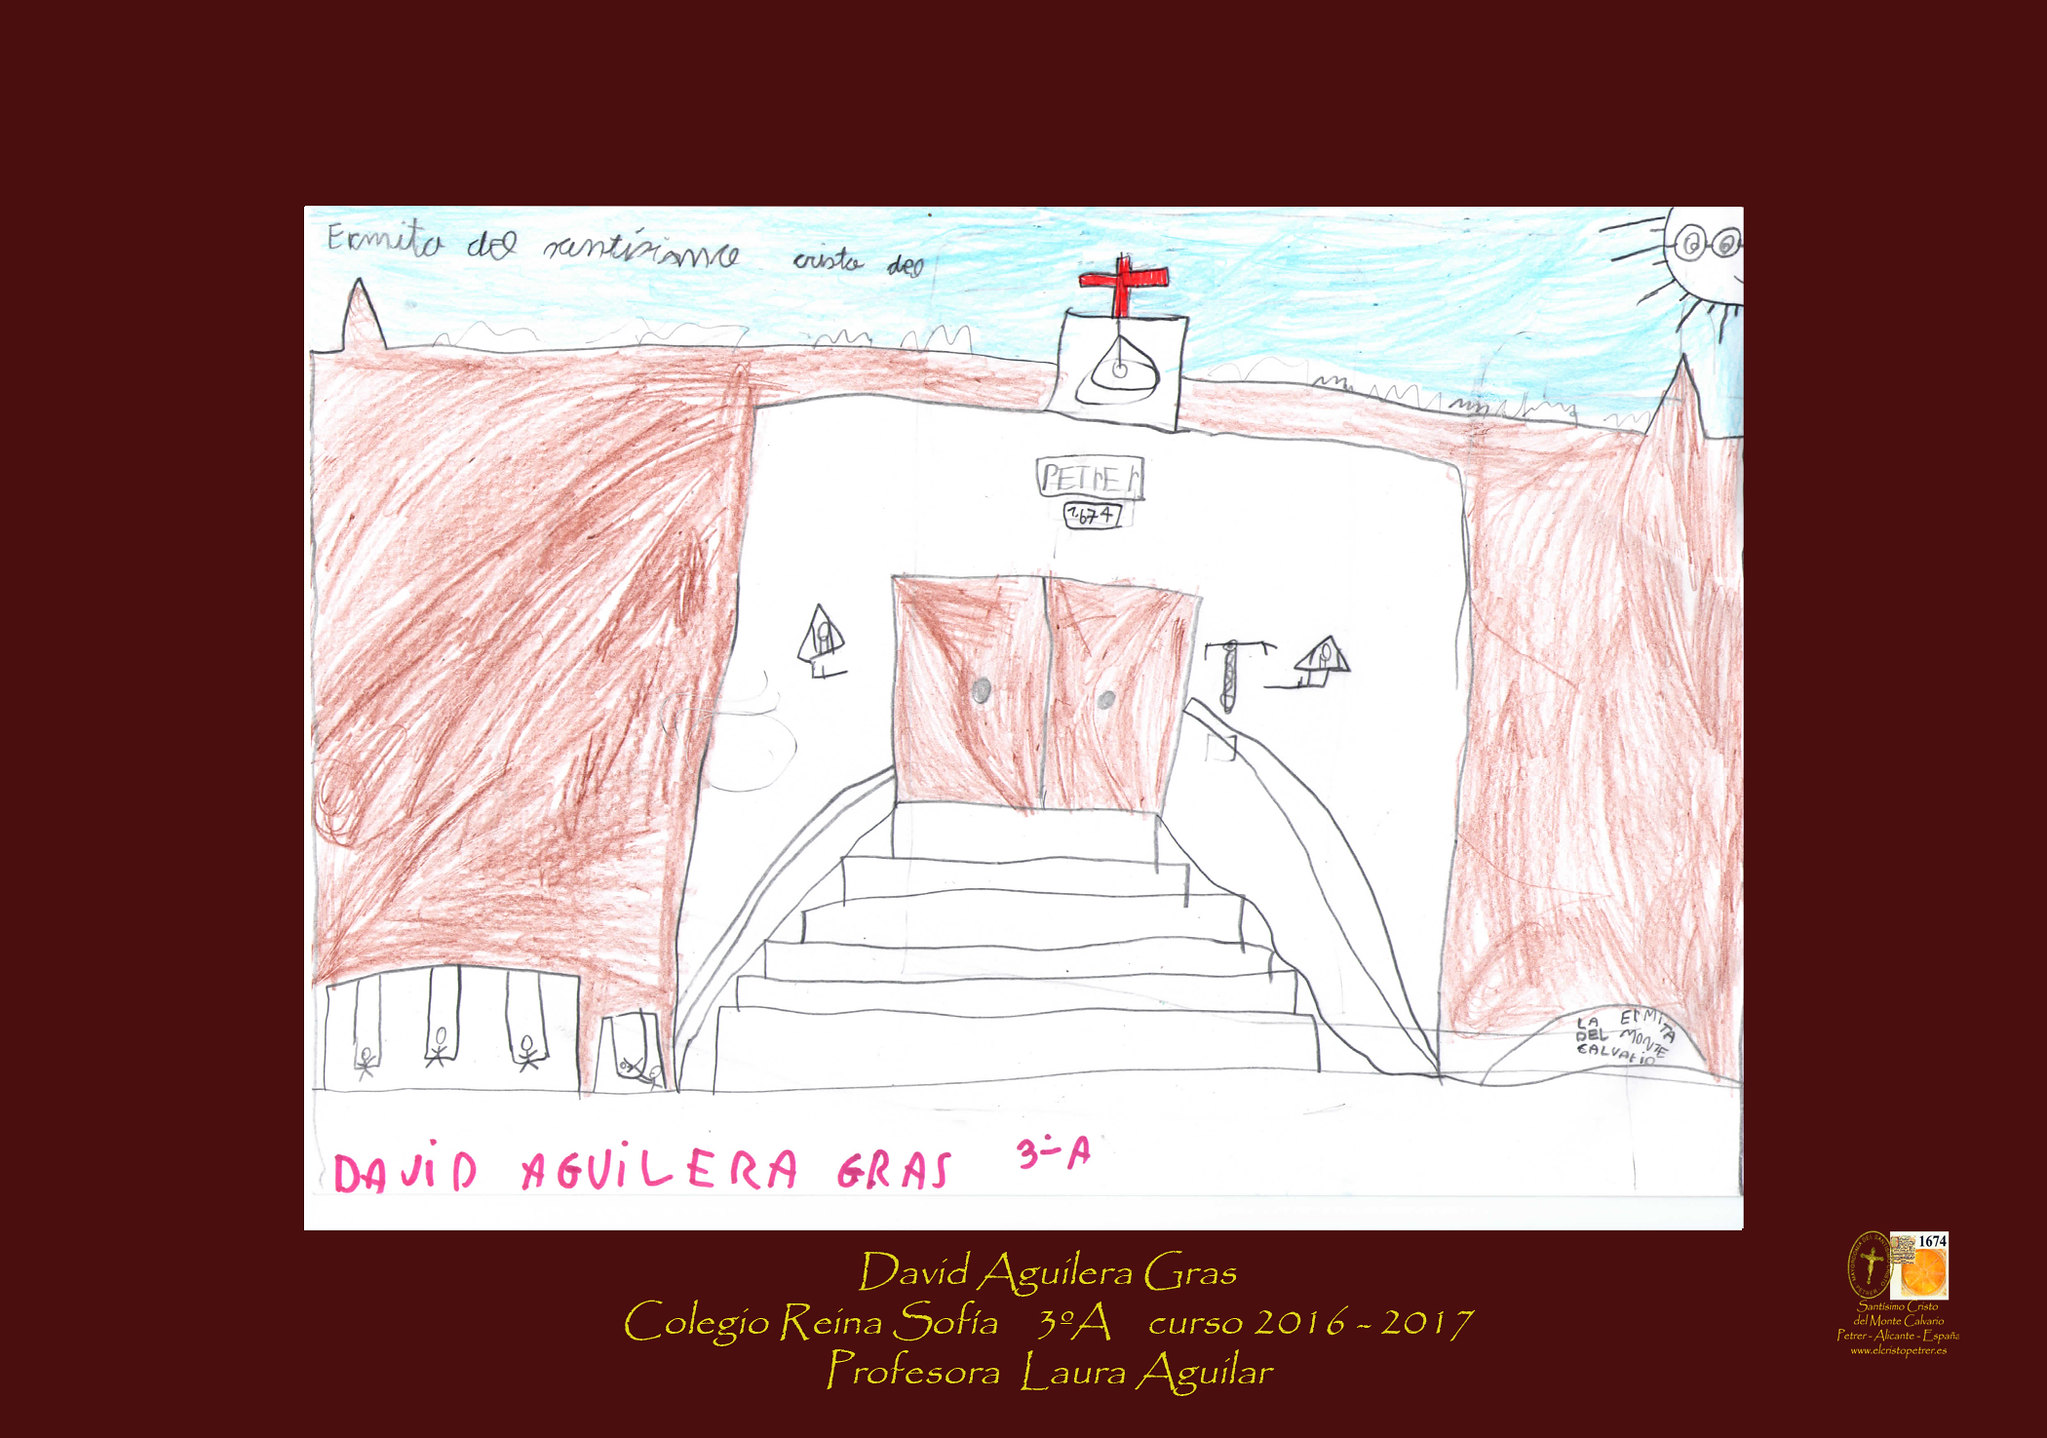 ElCristo - Actos - Exposicion Fotografica - (2017-12-01) - Reina sofía - 3ºA - David